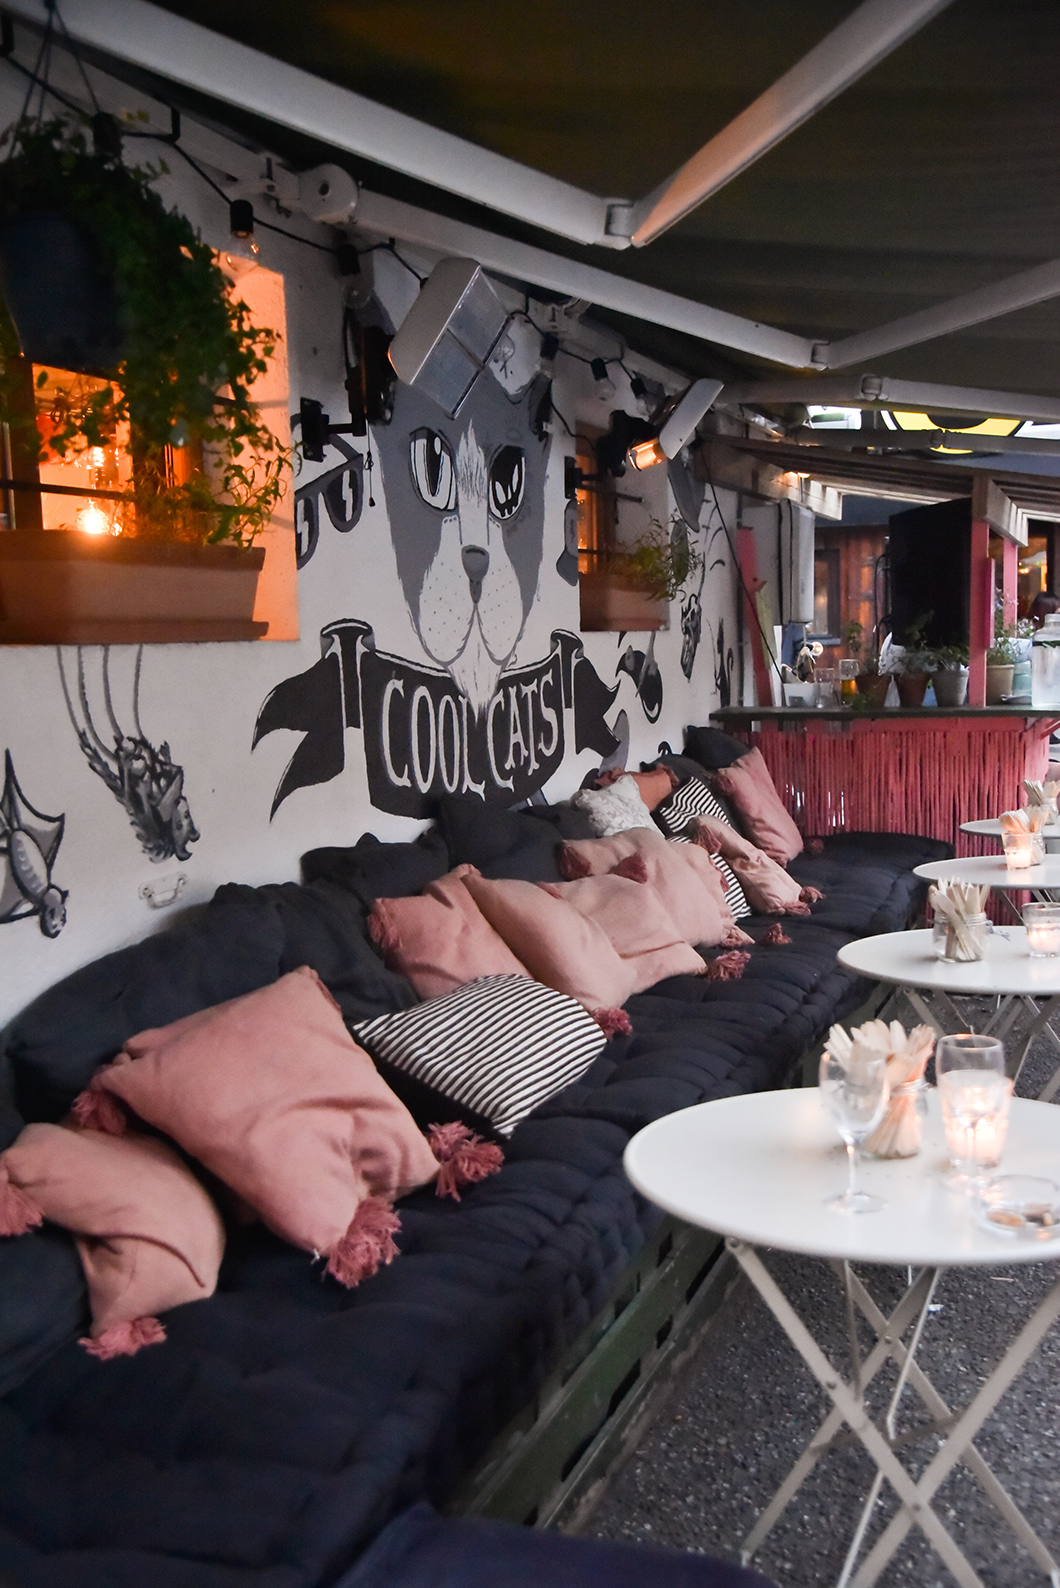 Où manger de la street food à Chamonix ? Restaurant Cool Cats